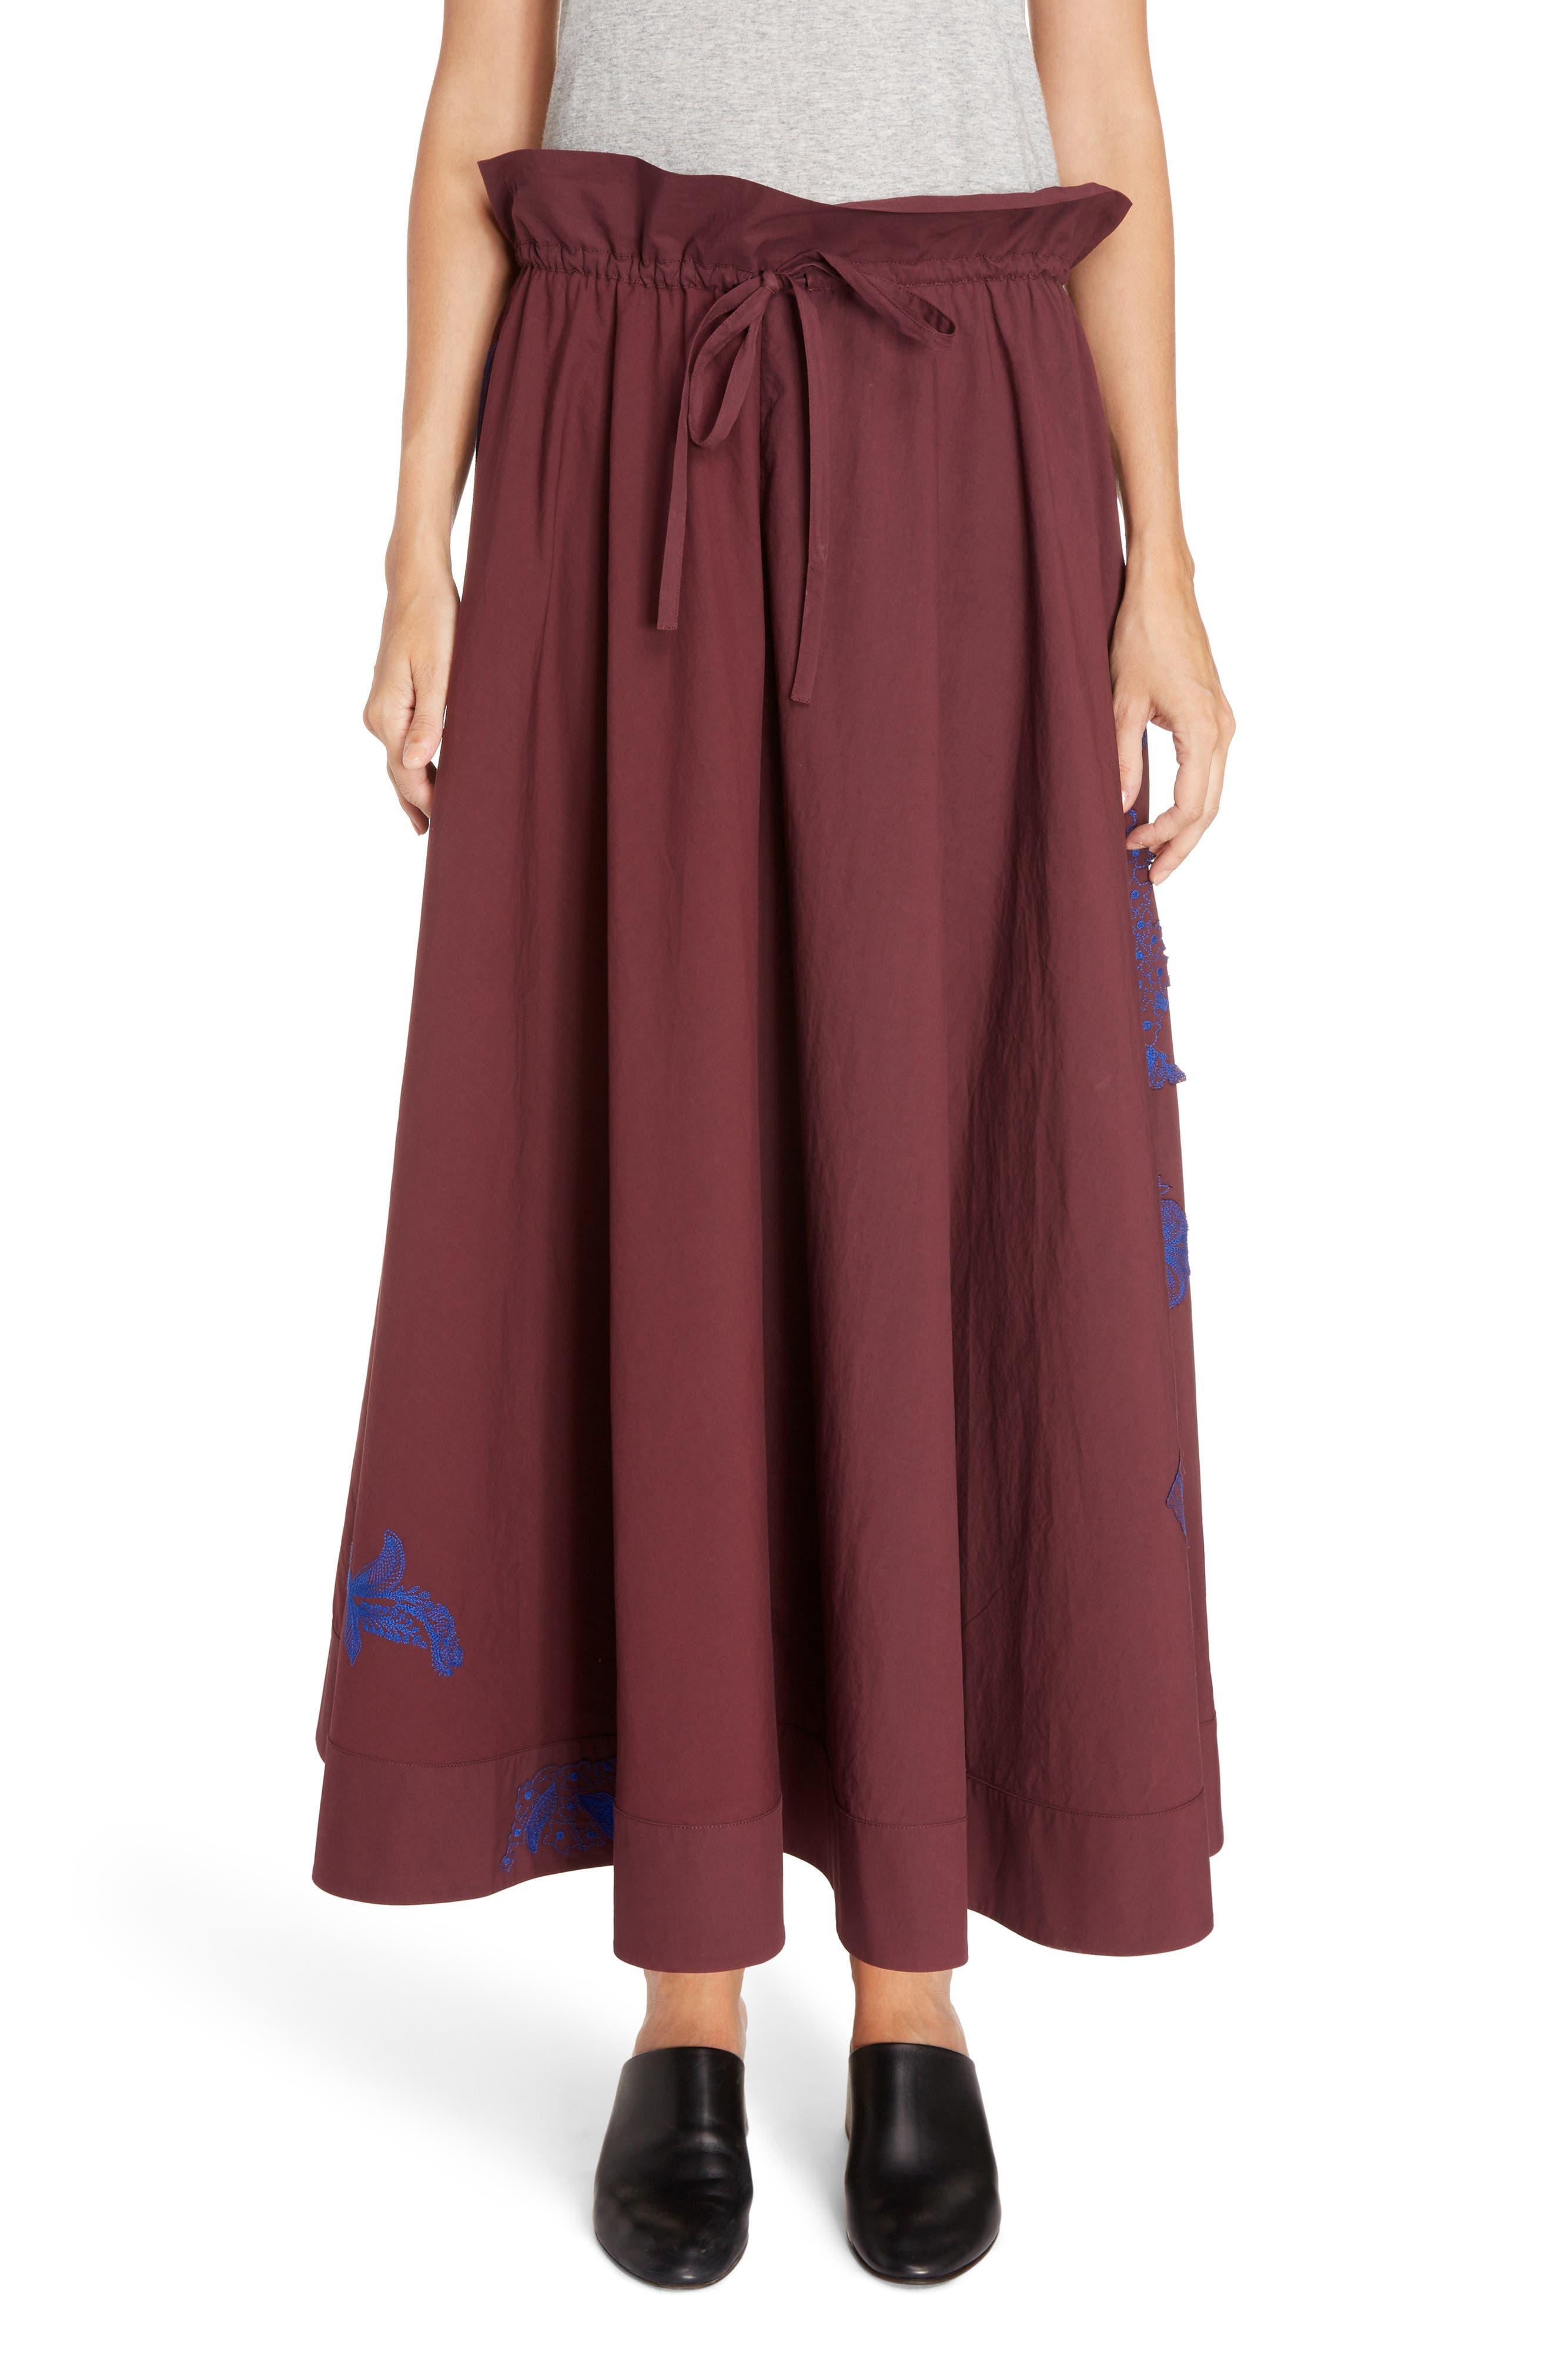 Hela Tie Waist Skirt,                             Main thumbnail 1, color,                             930